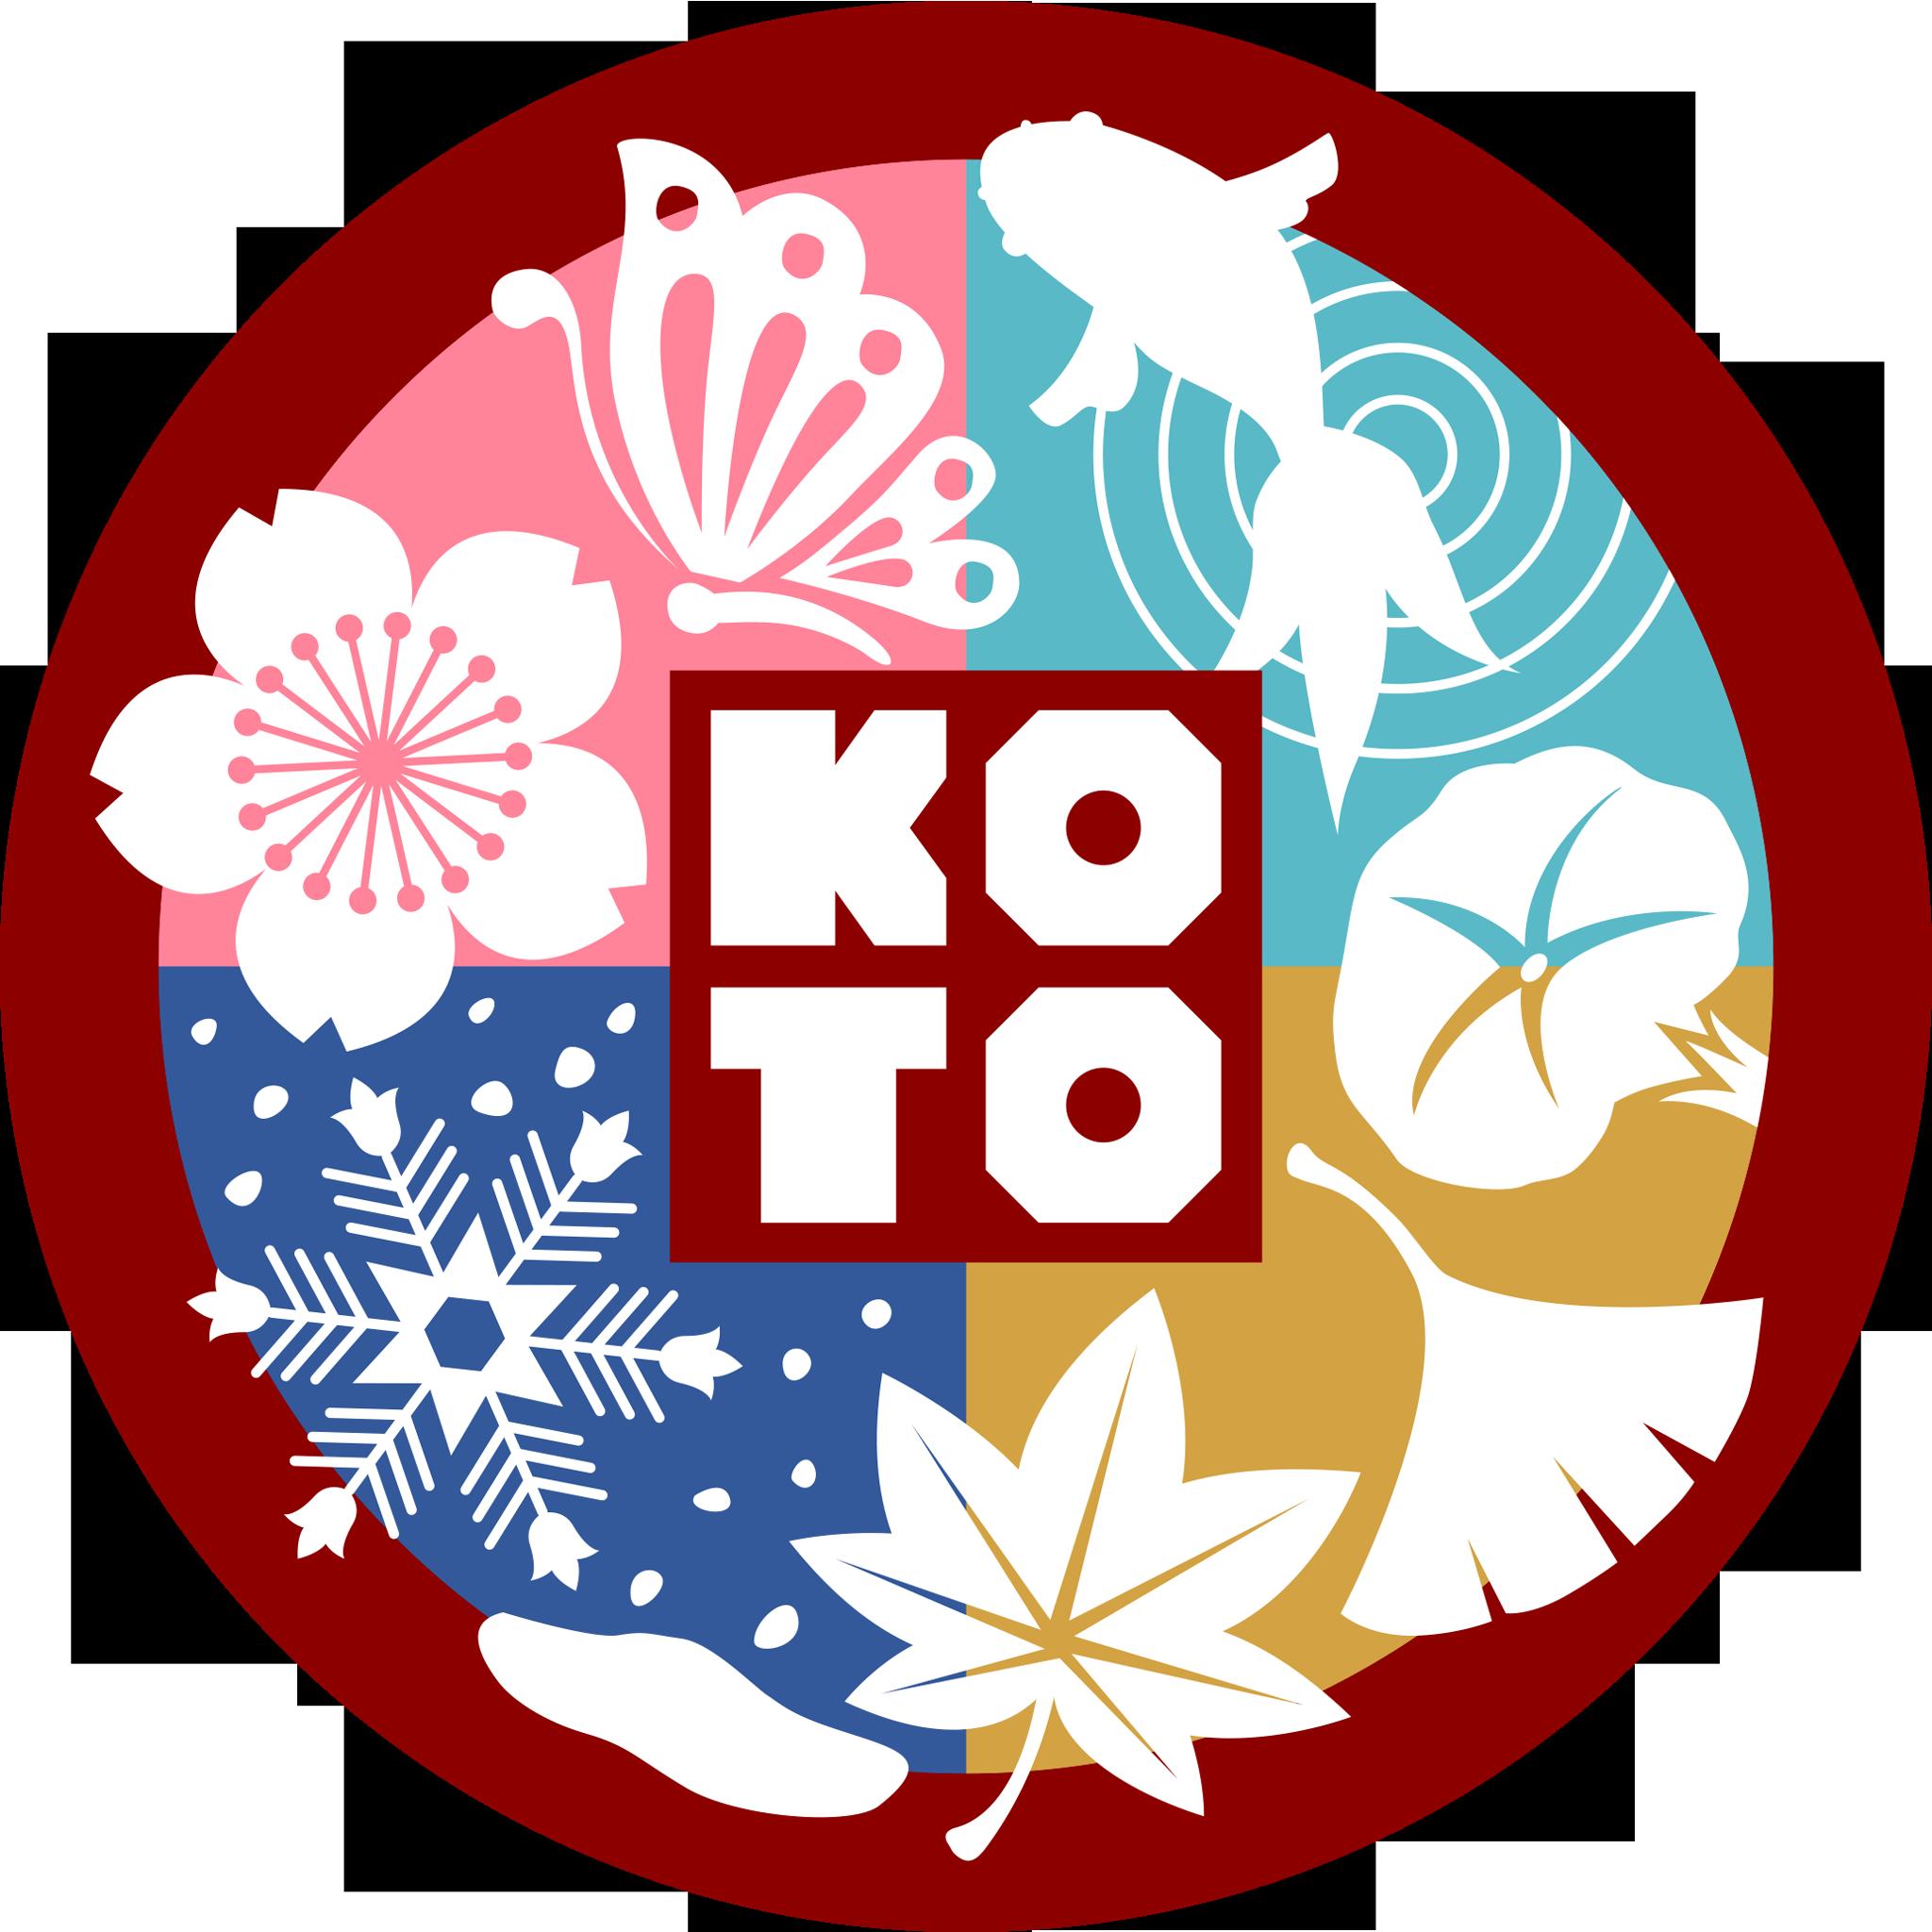 koto_logo_color2048.png